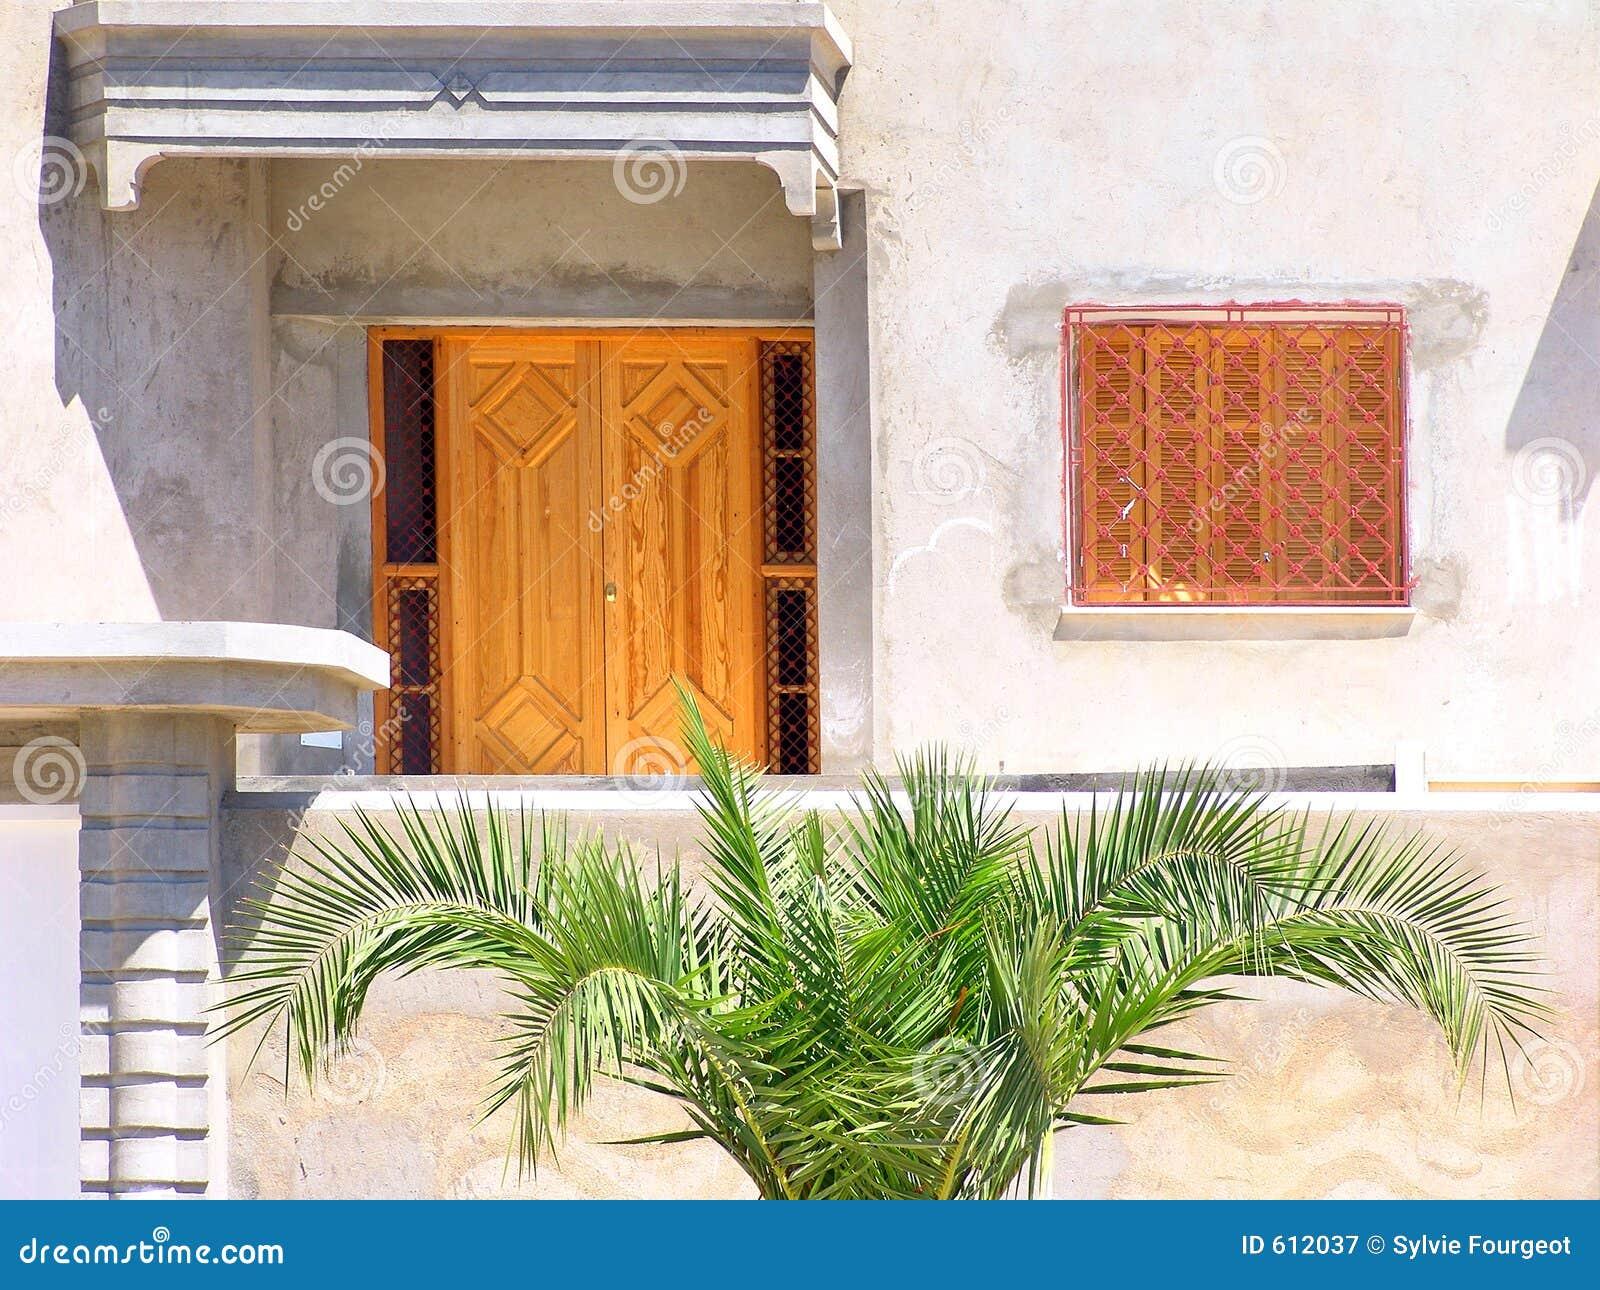 Frontage of tunisian house stock image image 612037 for Maison de senteur tunisie adresse